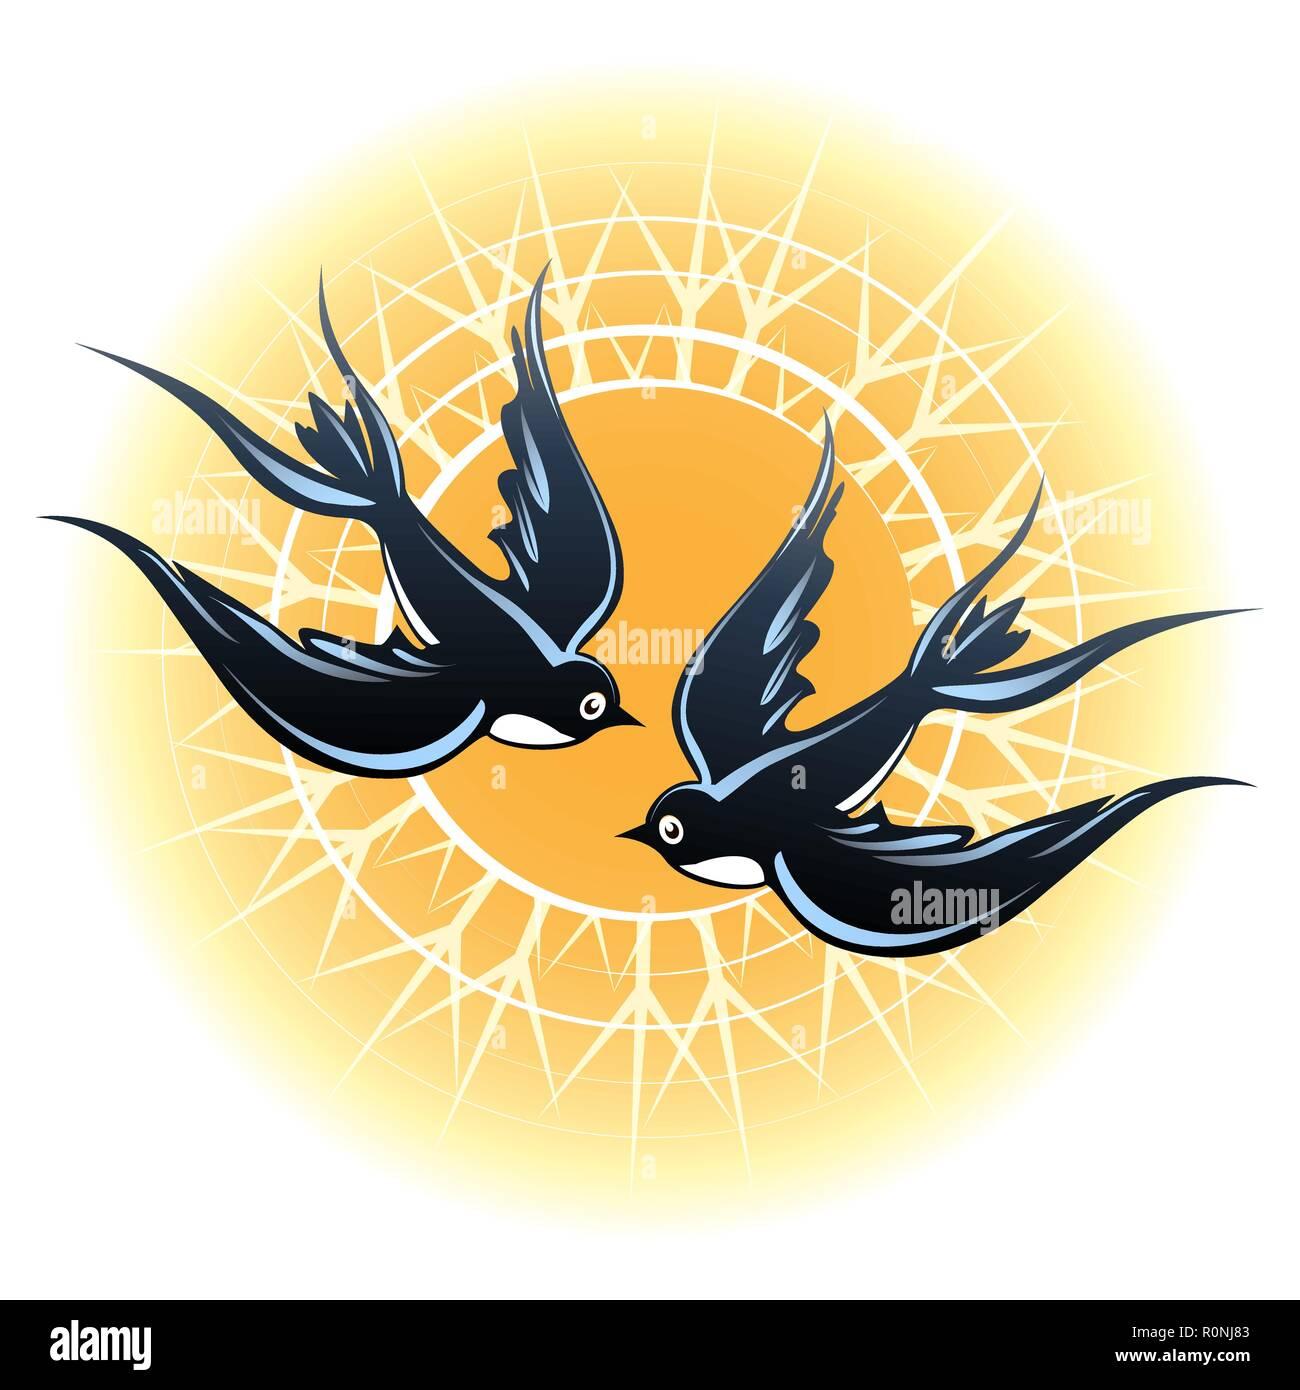 Two flying swallow birds against shining sun. Vector illustration. - Stock Vector